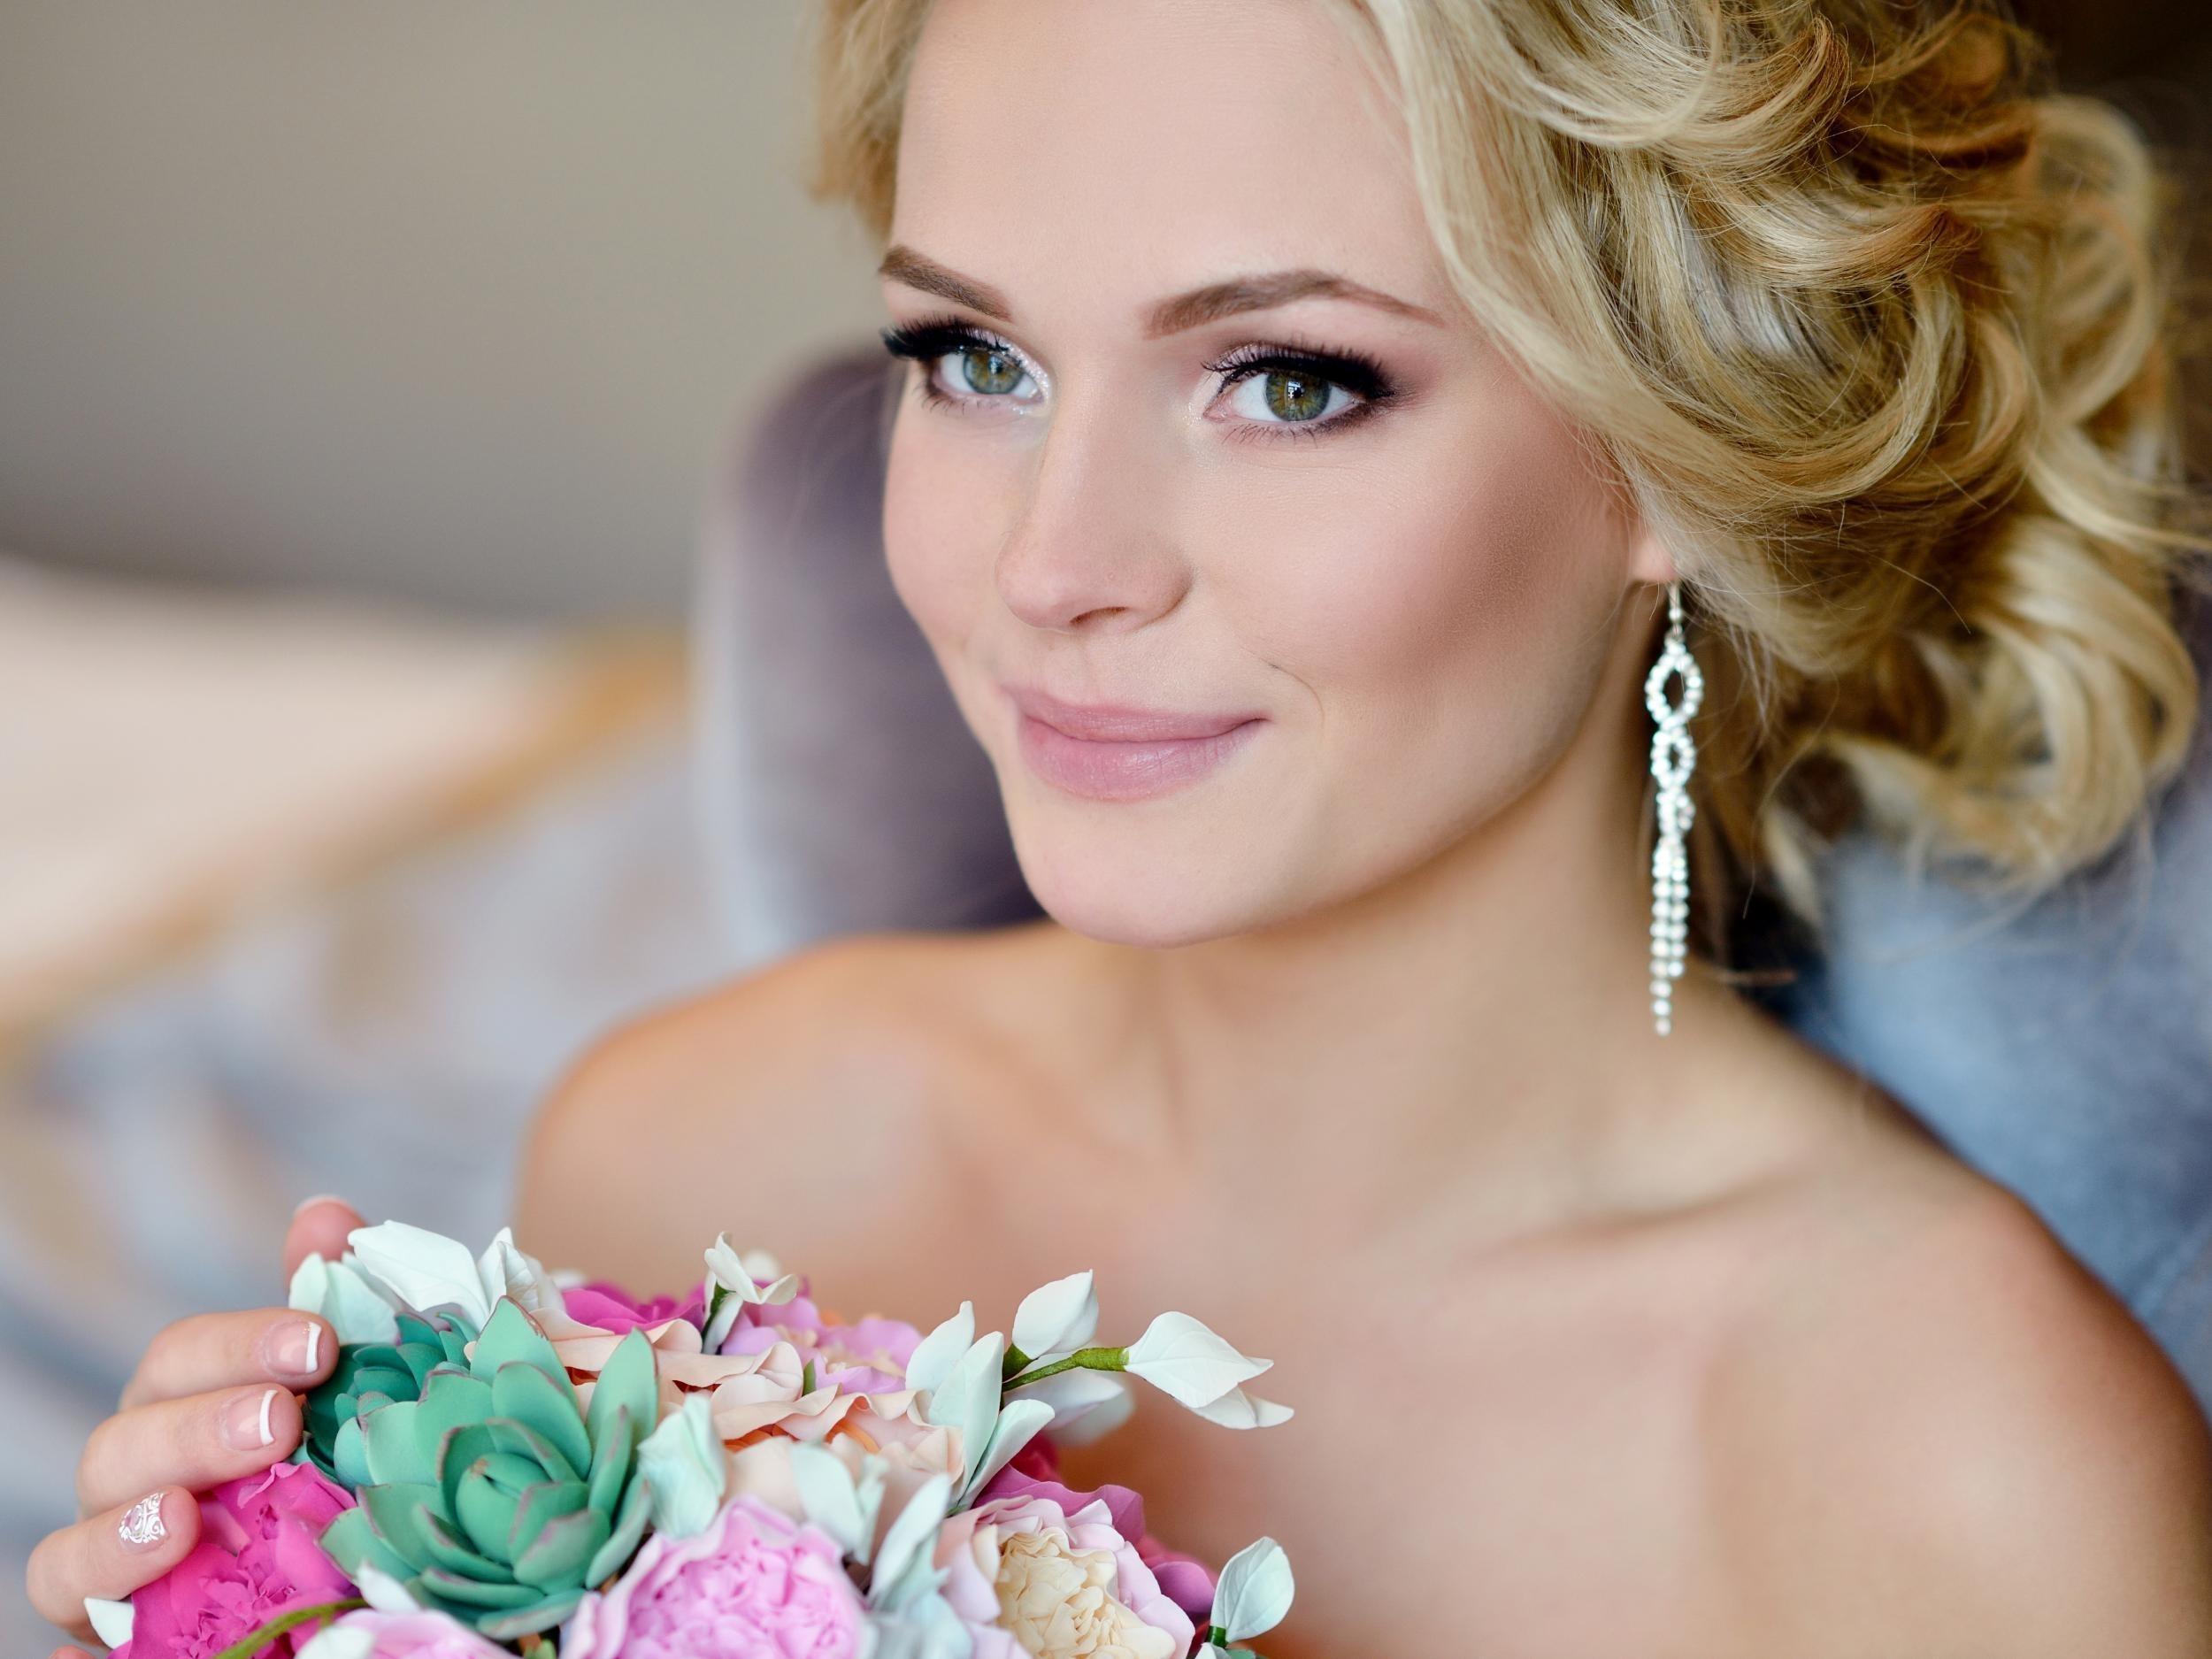 best makeup for wedding photos uk – wavy haircut